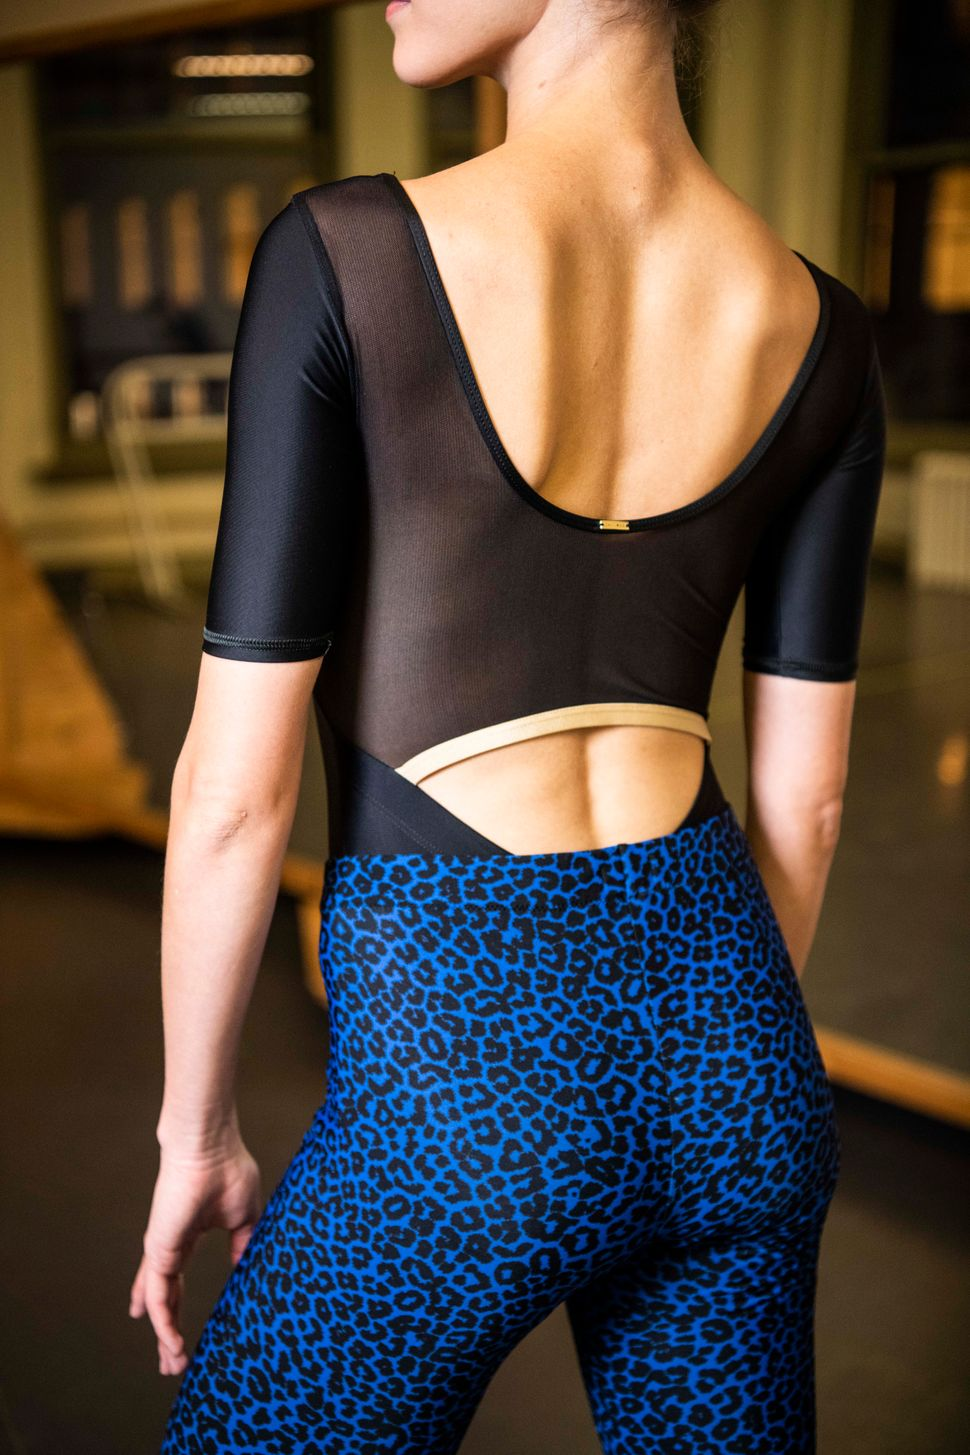 "Teuscher in her a&nbsp;<a href=""https://jaideedancewear.com/"" target=""_blank"" rel=""noopener noreferrer"">Jai-Dee</a> leotard and leggings by&nbsp;Radetsky."